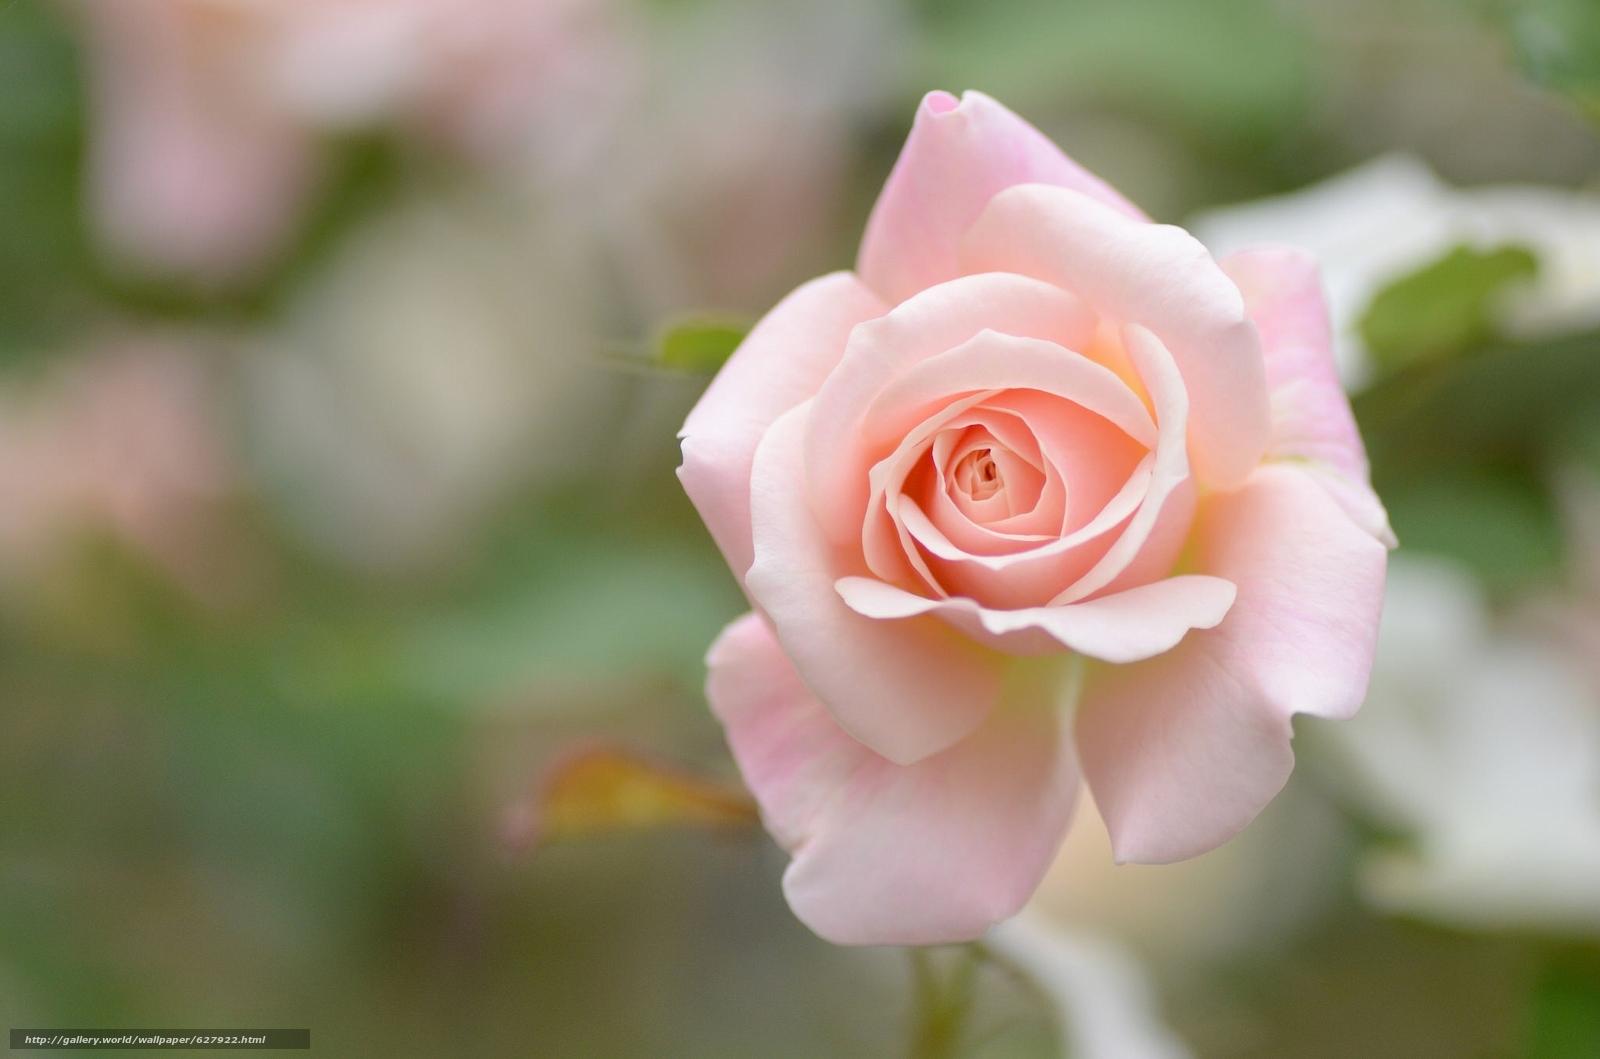 Скачать на телефон обои фото картинку на тему роза, бутон, макро, боке, разширение 2048x1356